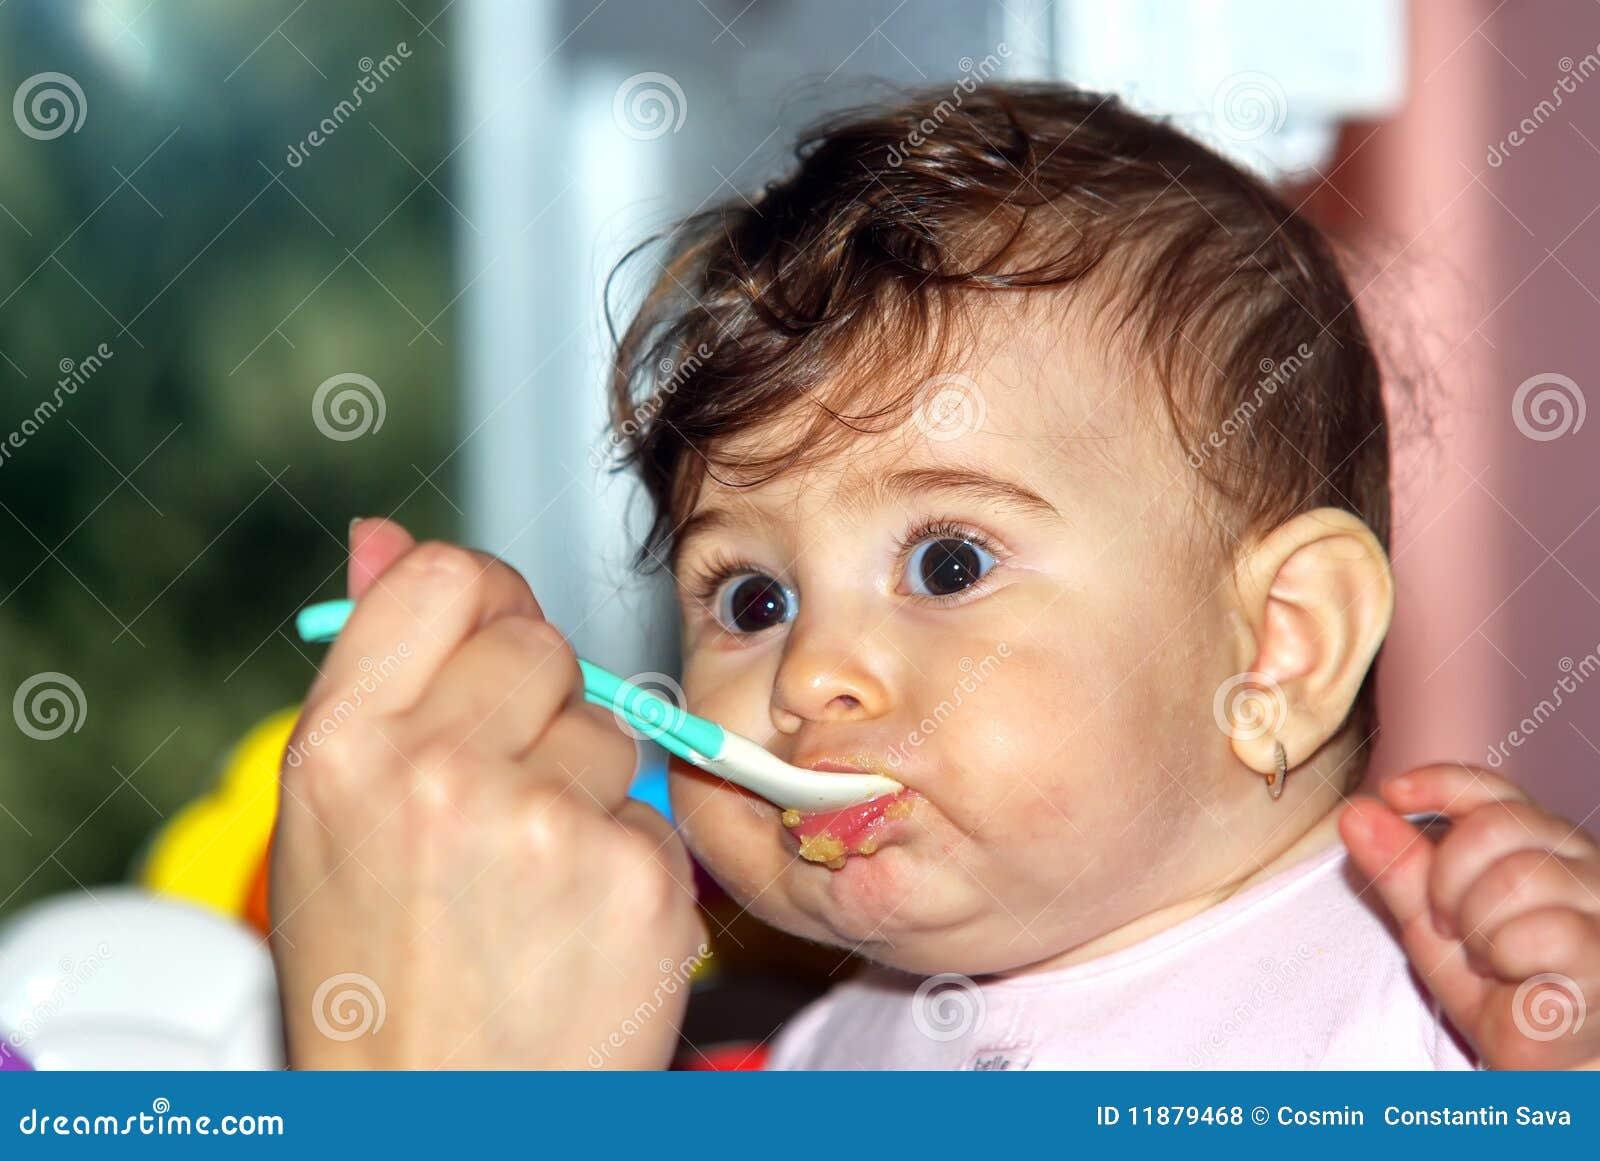 Cibo del bambino